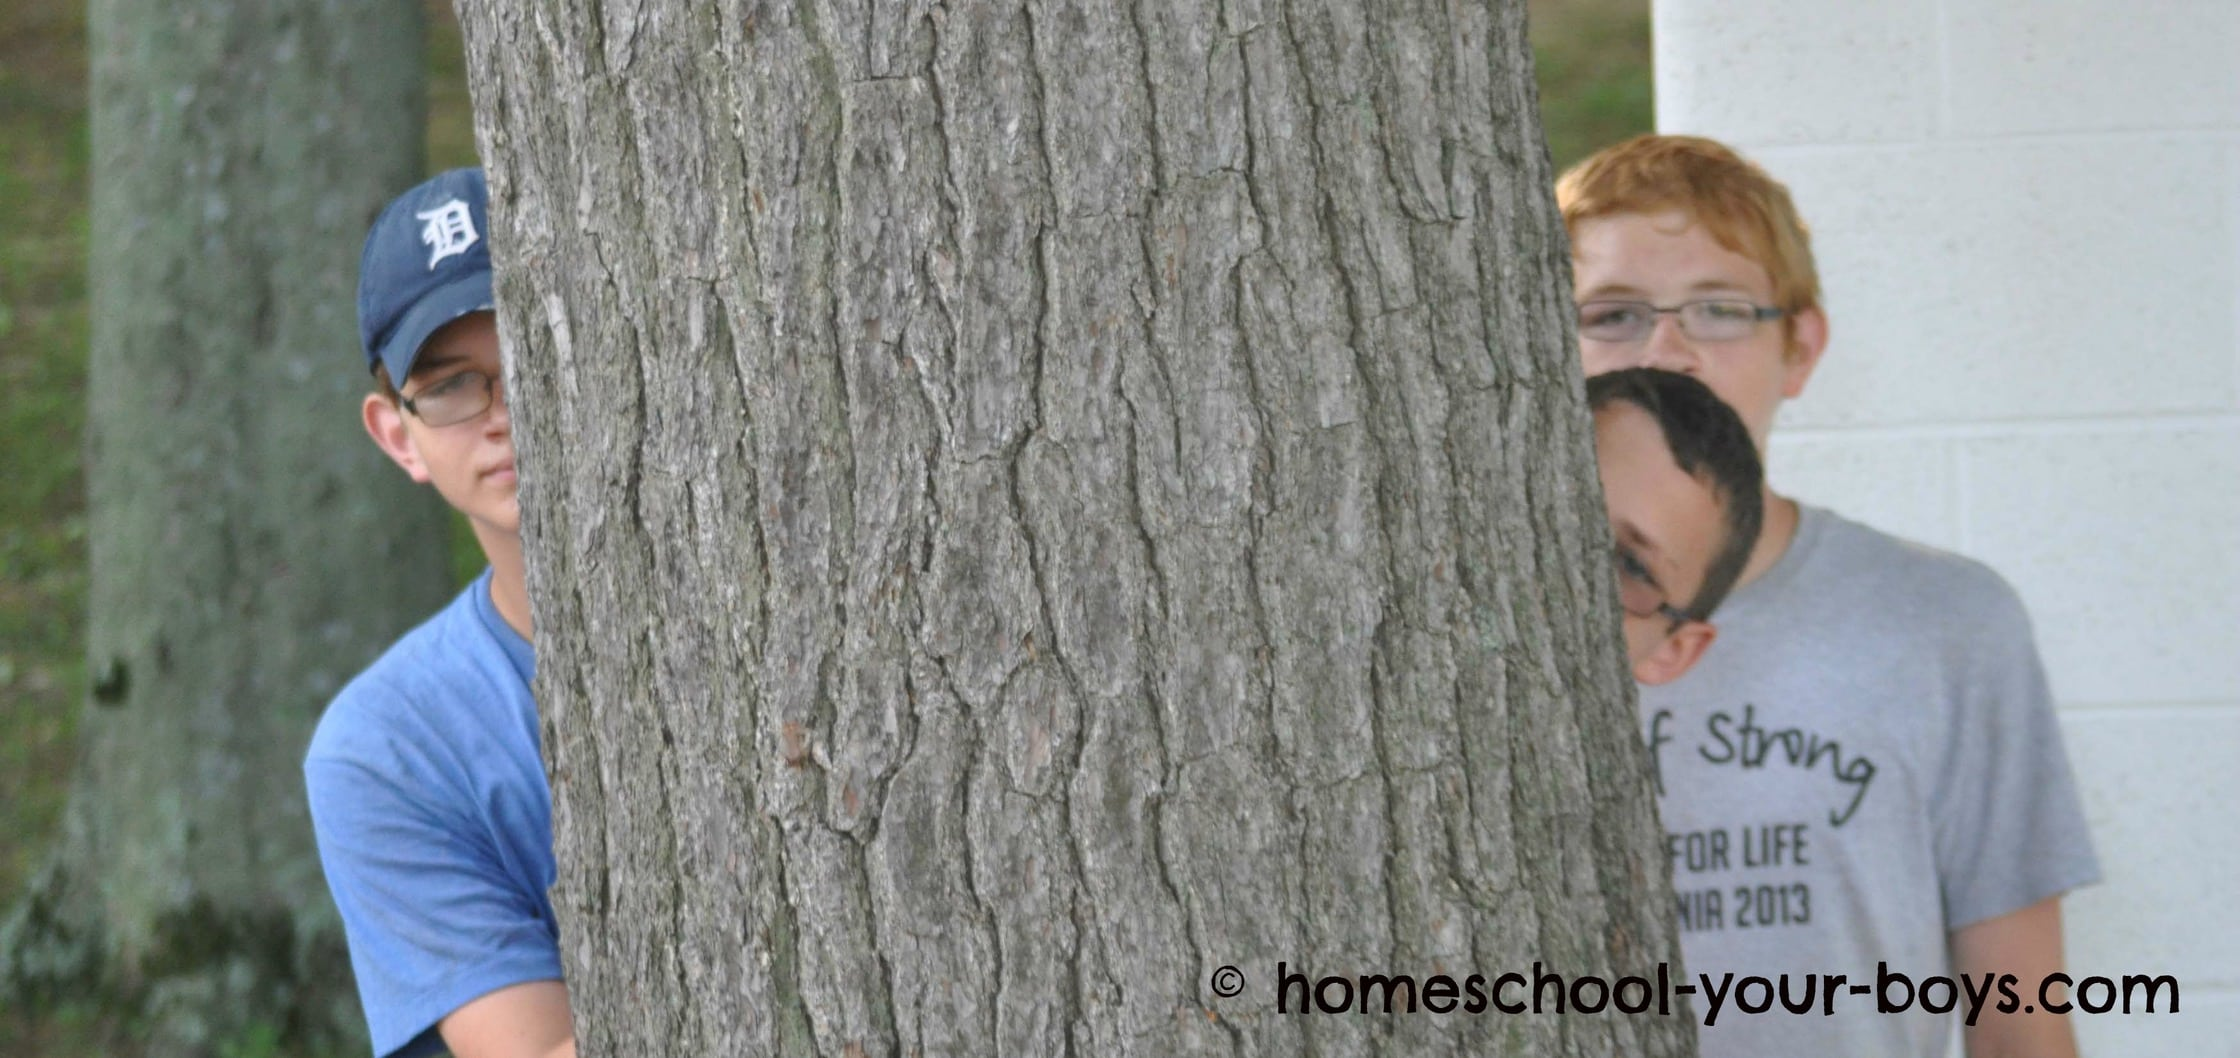 Homeschooling: Am I Doing Enough?